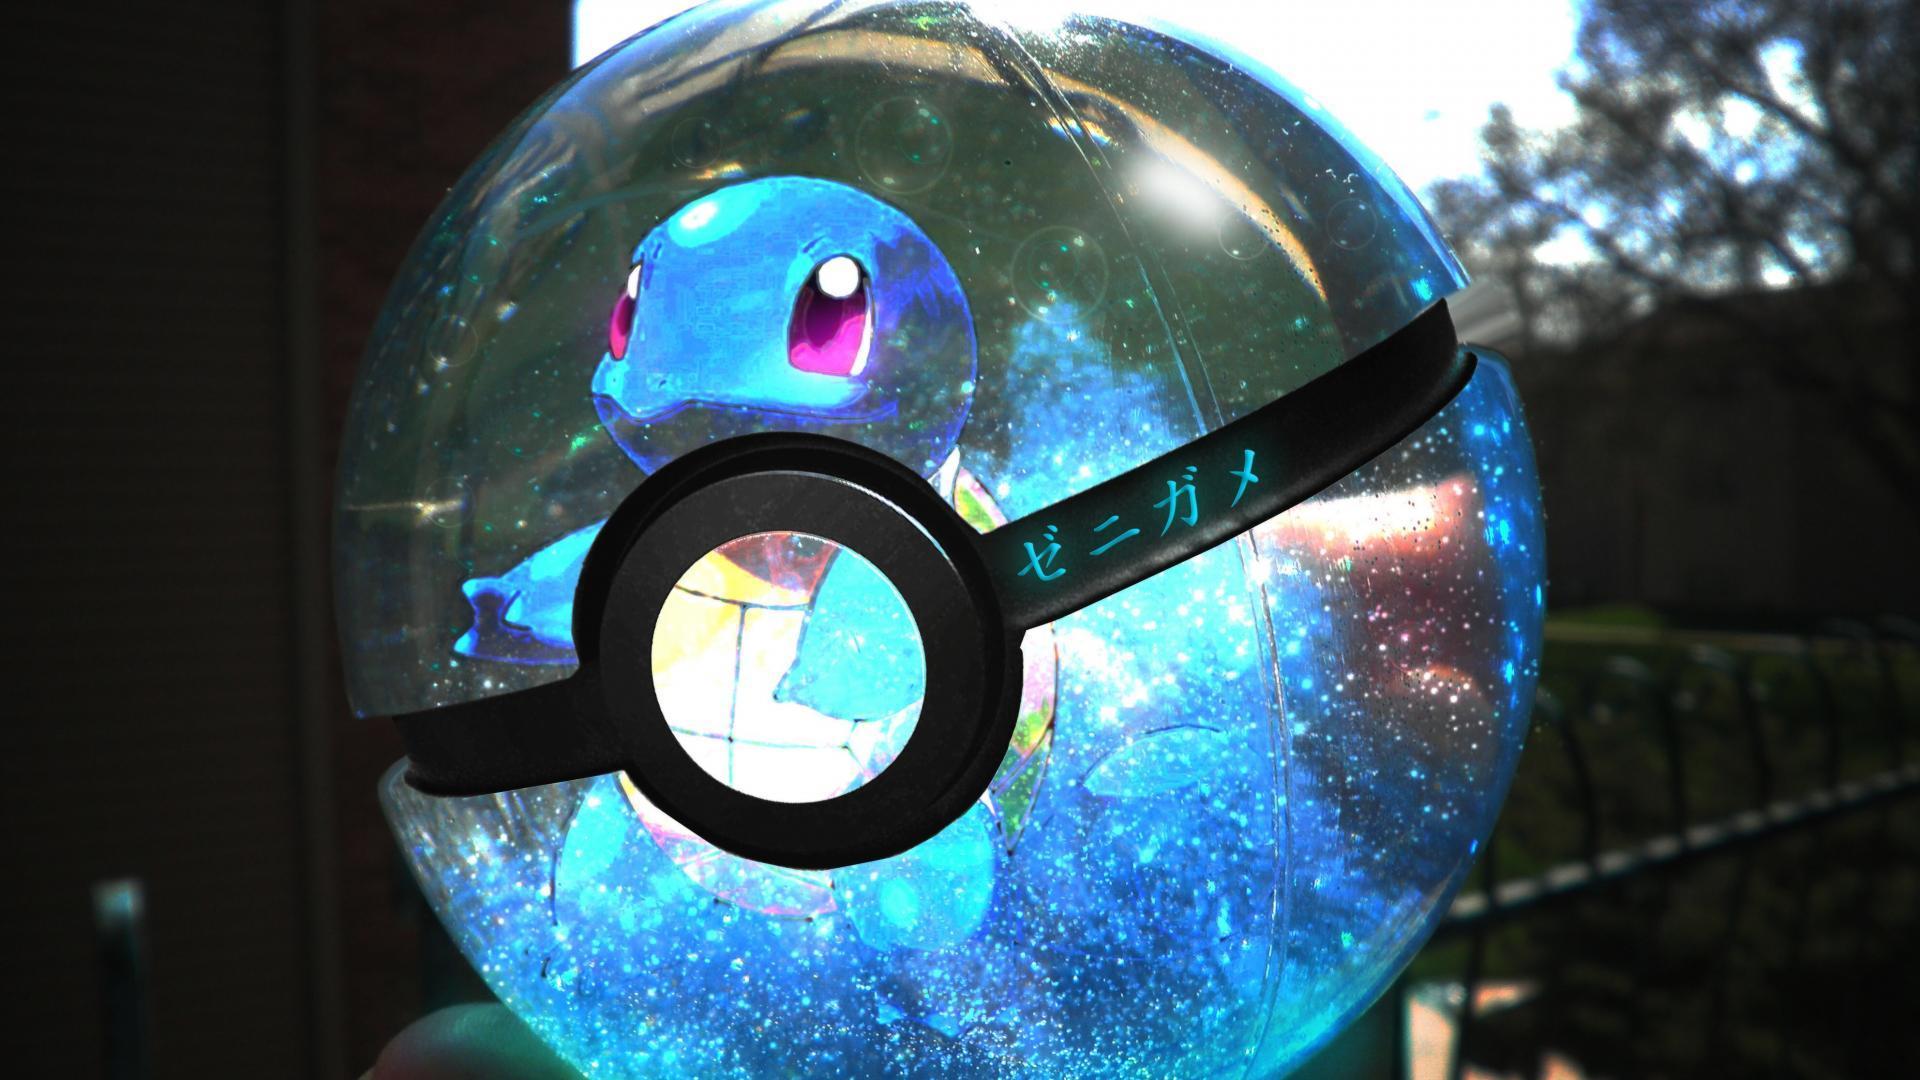 1920x1080 Poke Balls Pokeball Pokemon Minimalistic Wallpaper